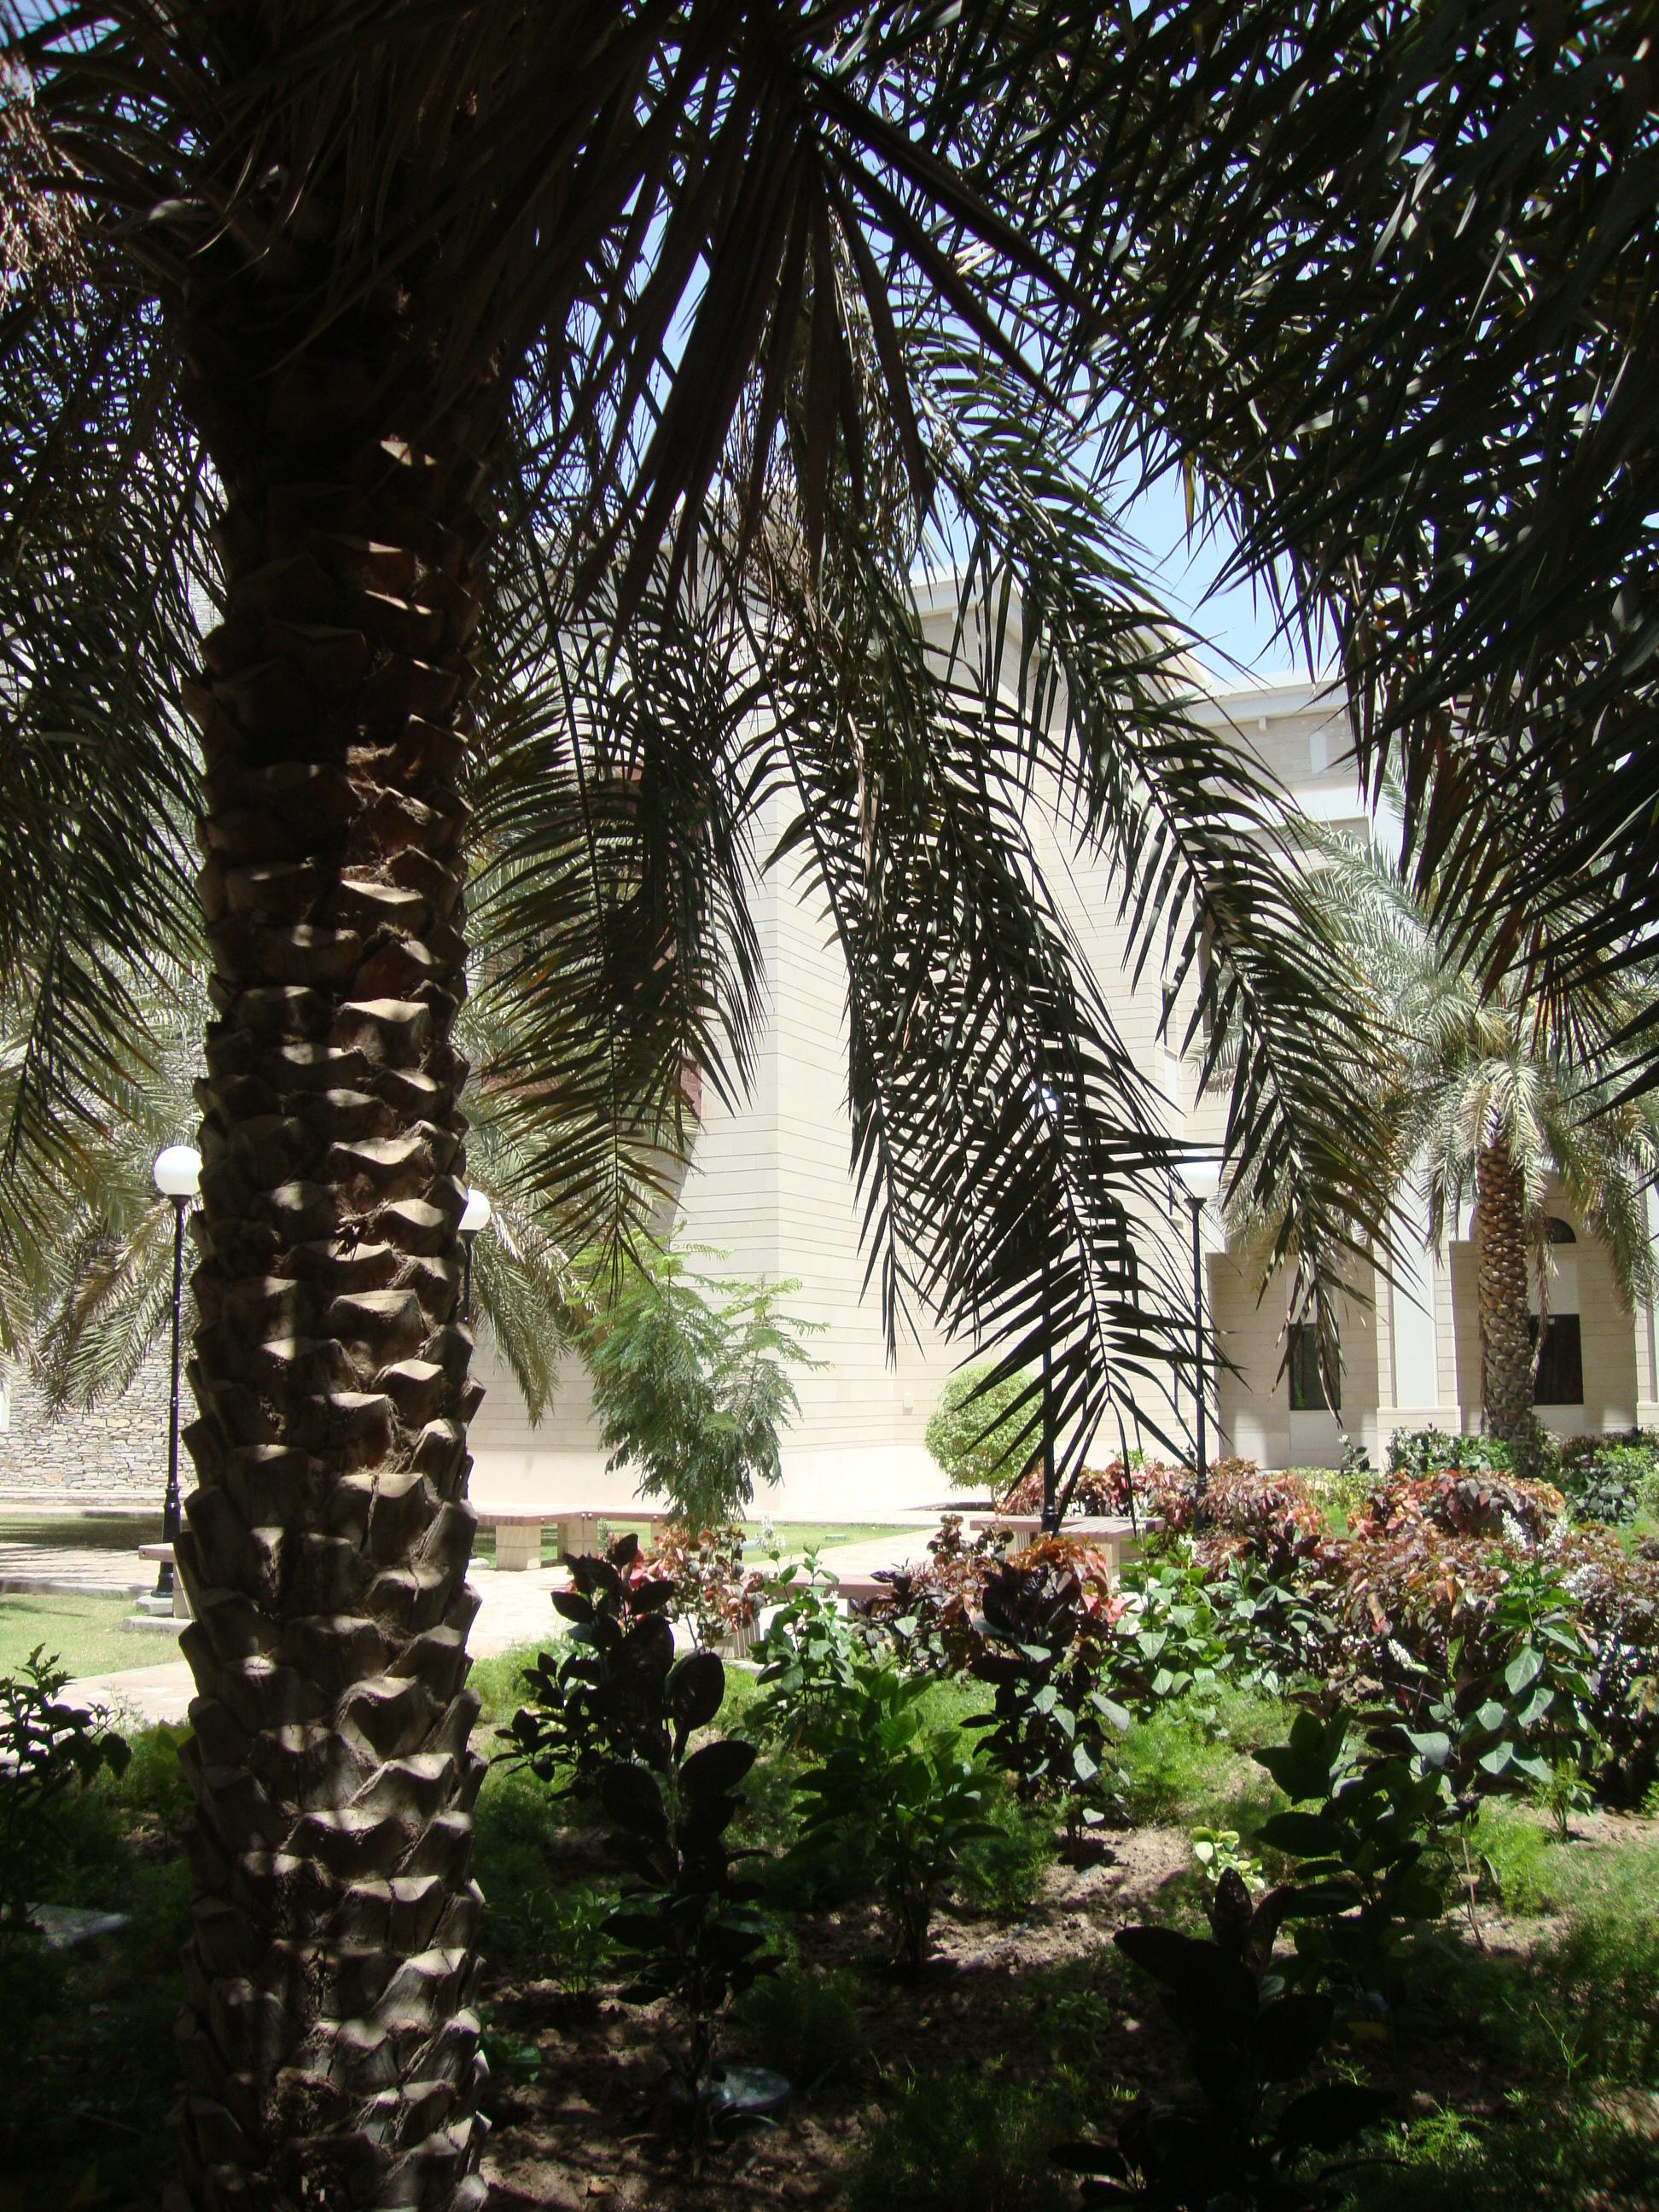 guide for new teachers sultan qaboos university